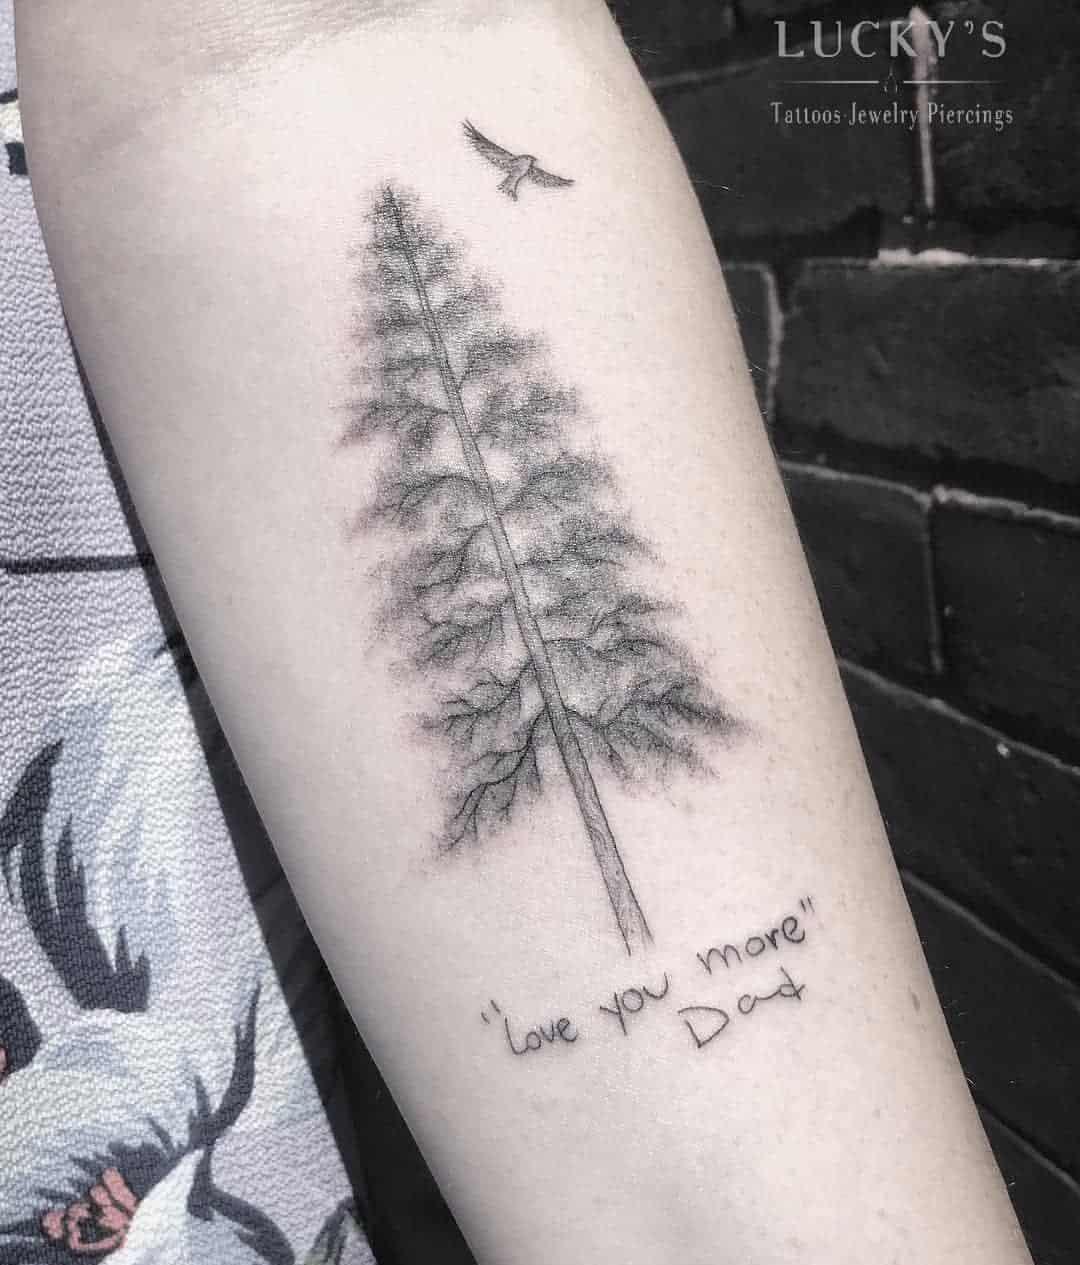 tattoo by @luckysnoho